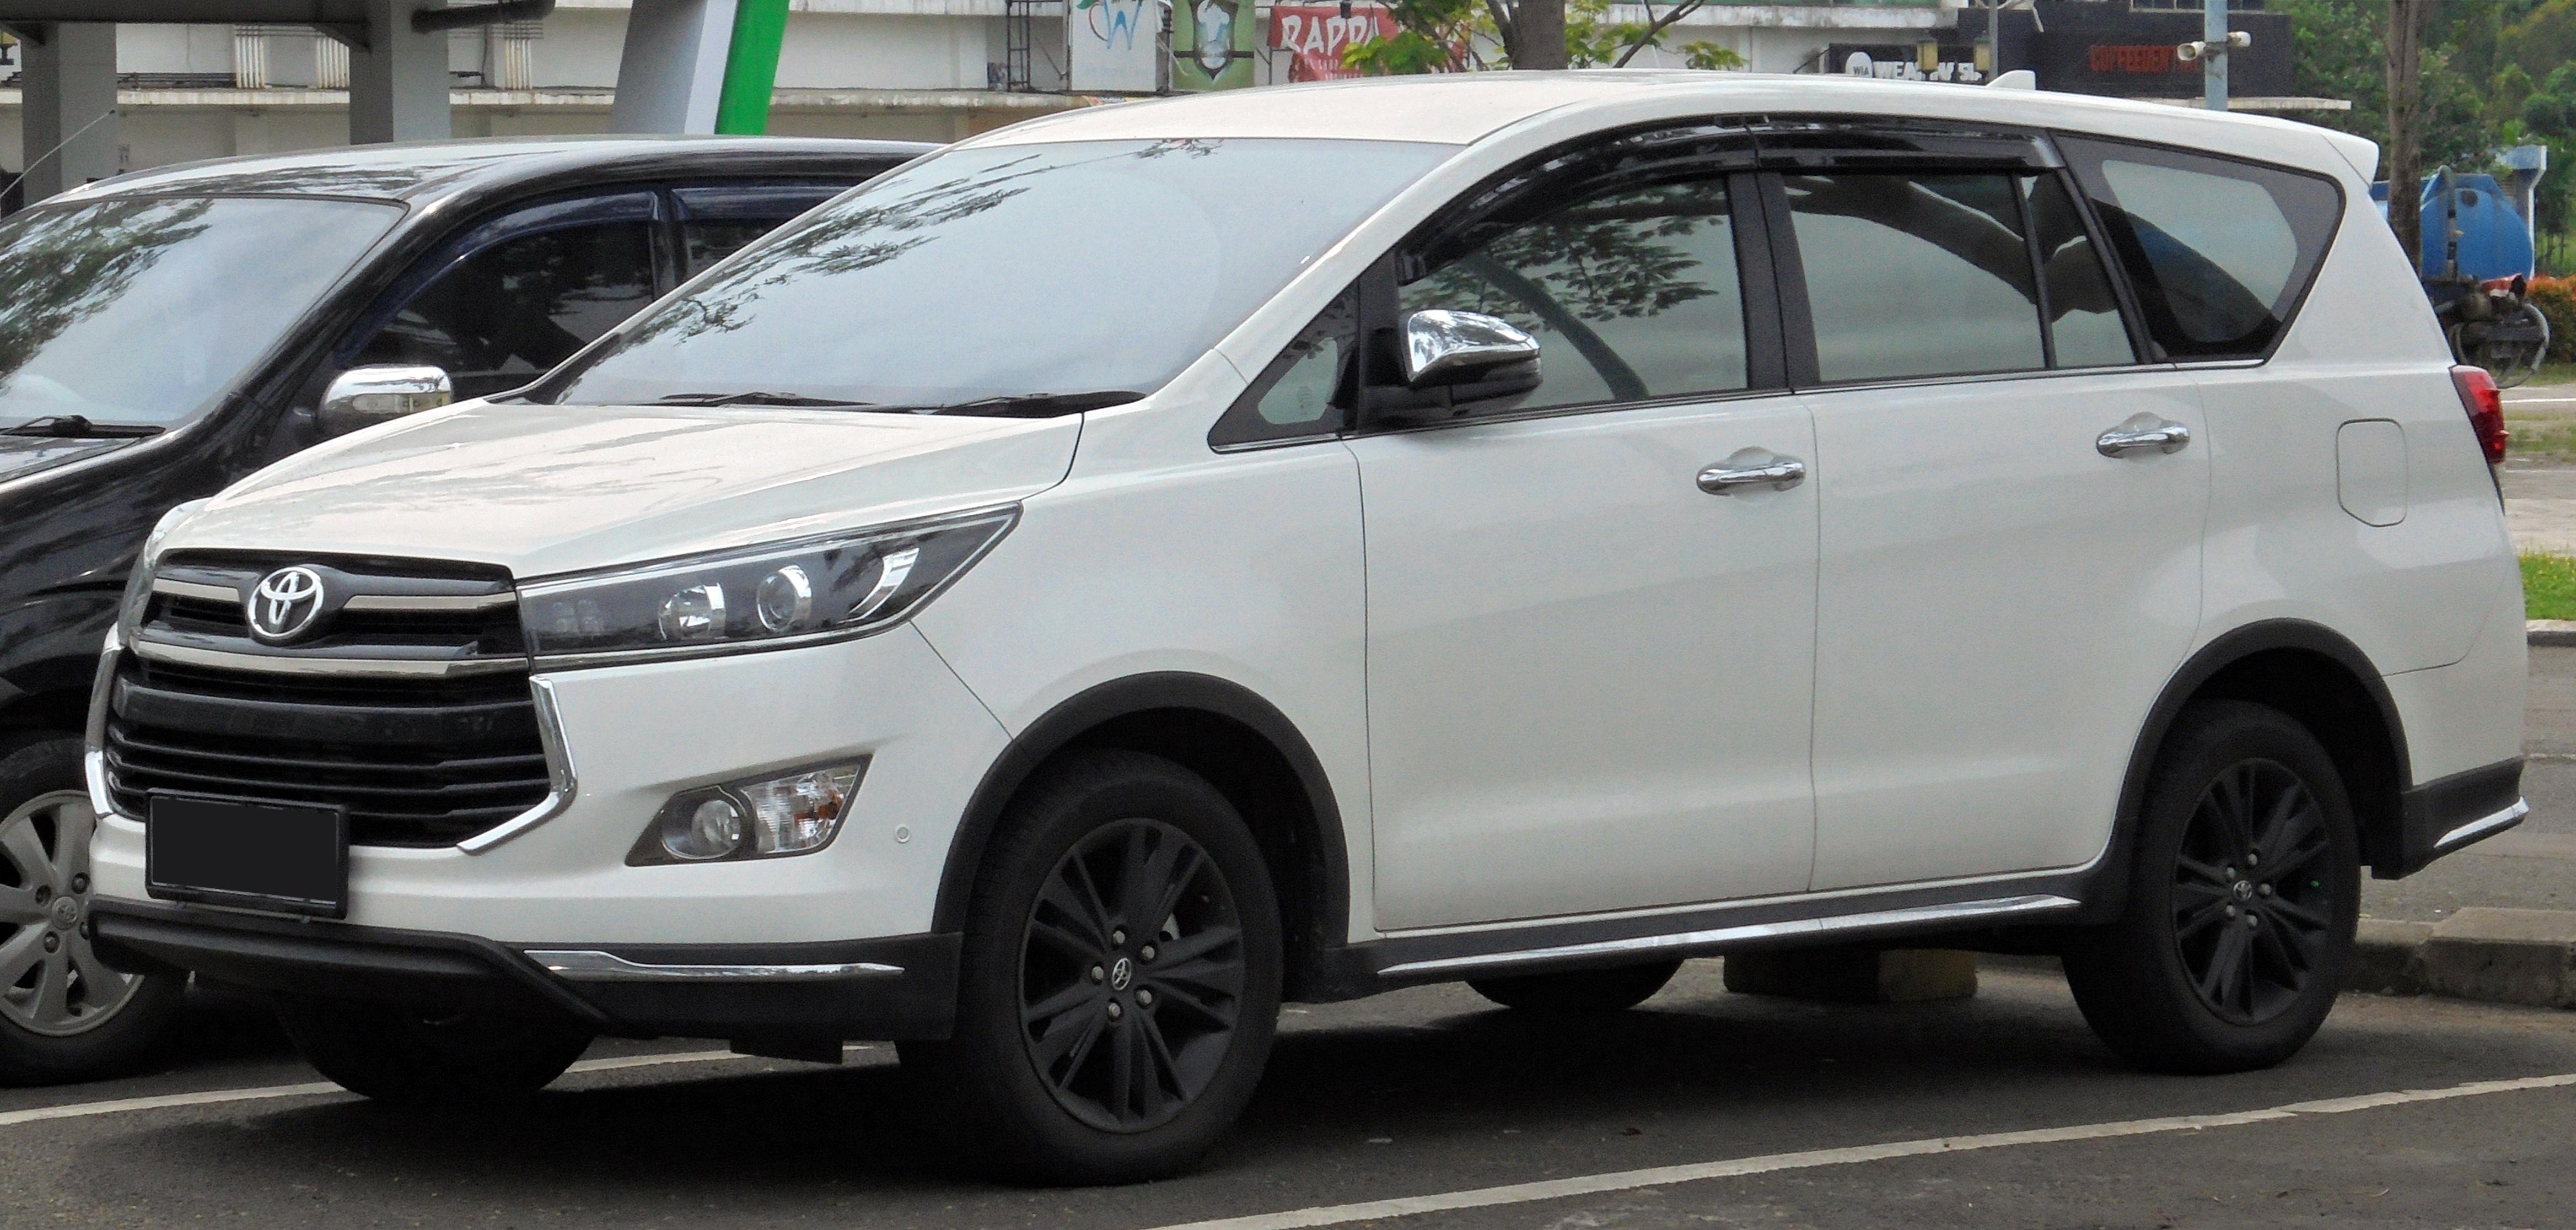 Kelebihan Kekurangan Toyota Kijang Innova Venturer Spesifikasi